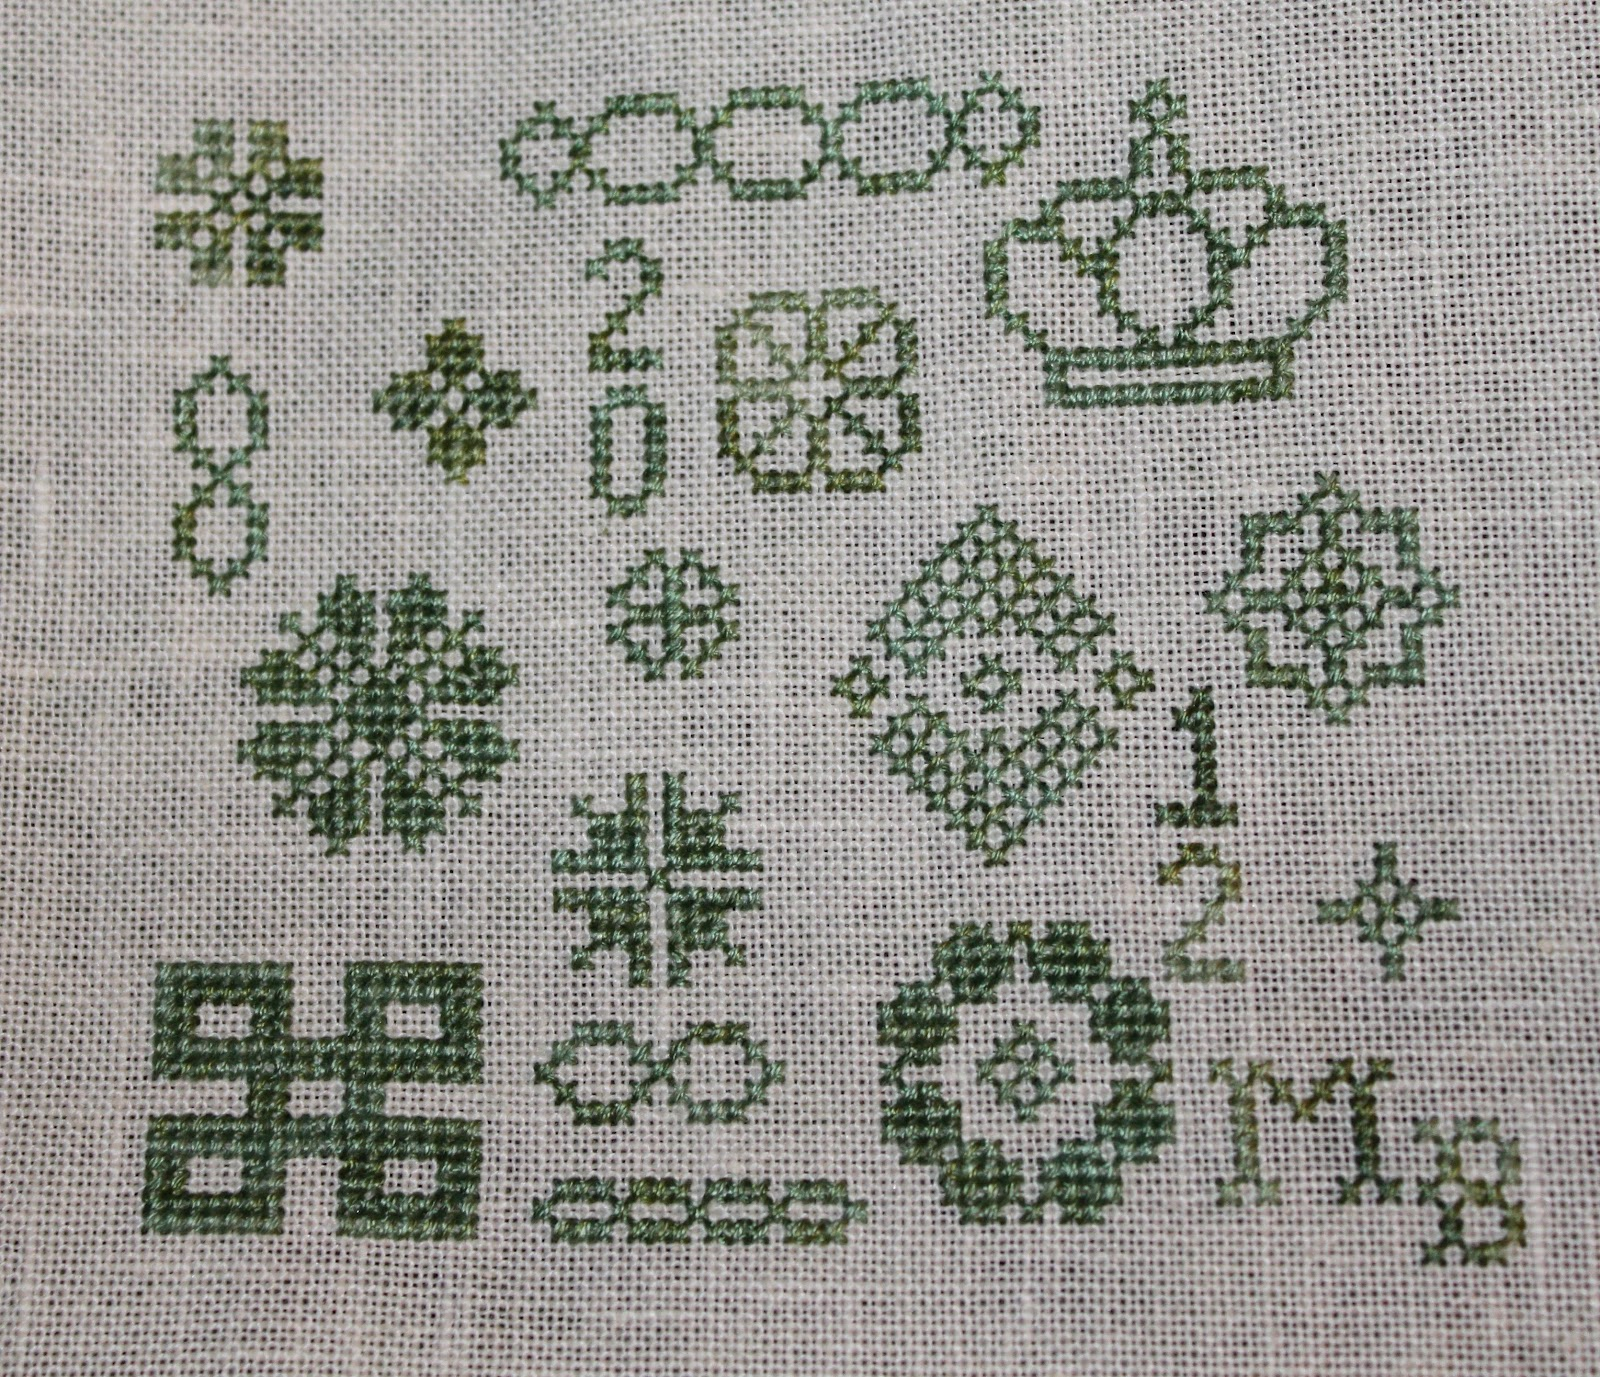 Knitting Cross Stitch Pattern : Celtic Heart Knitting and Quilting: Cross Stitch Pouch